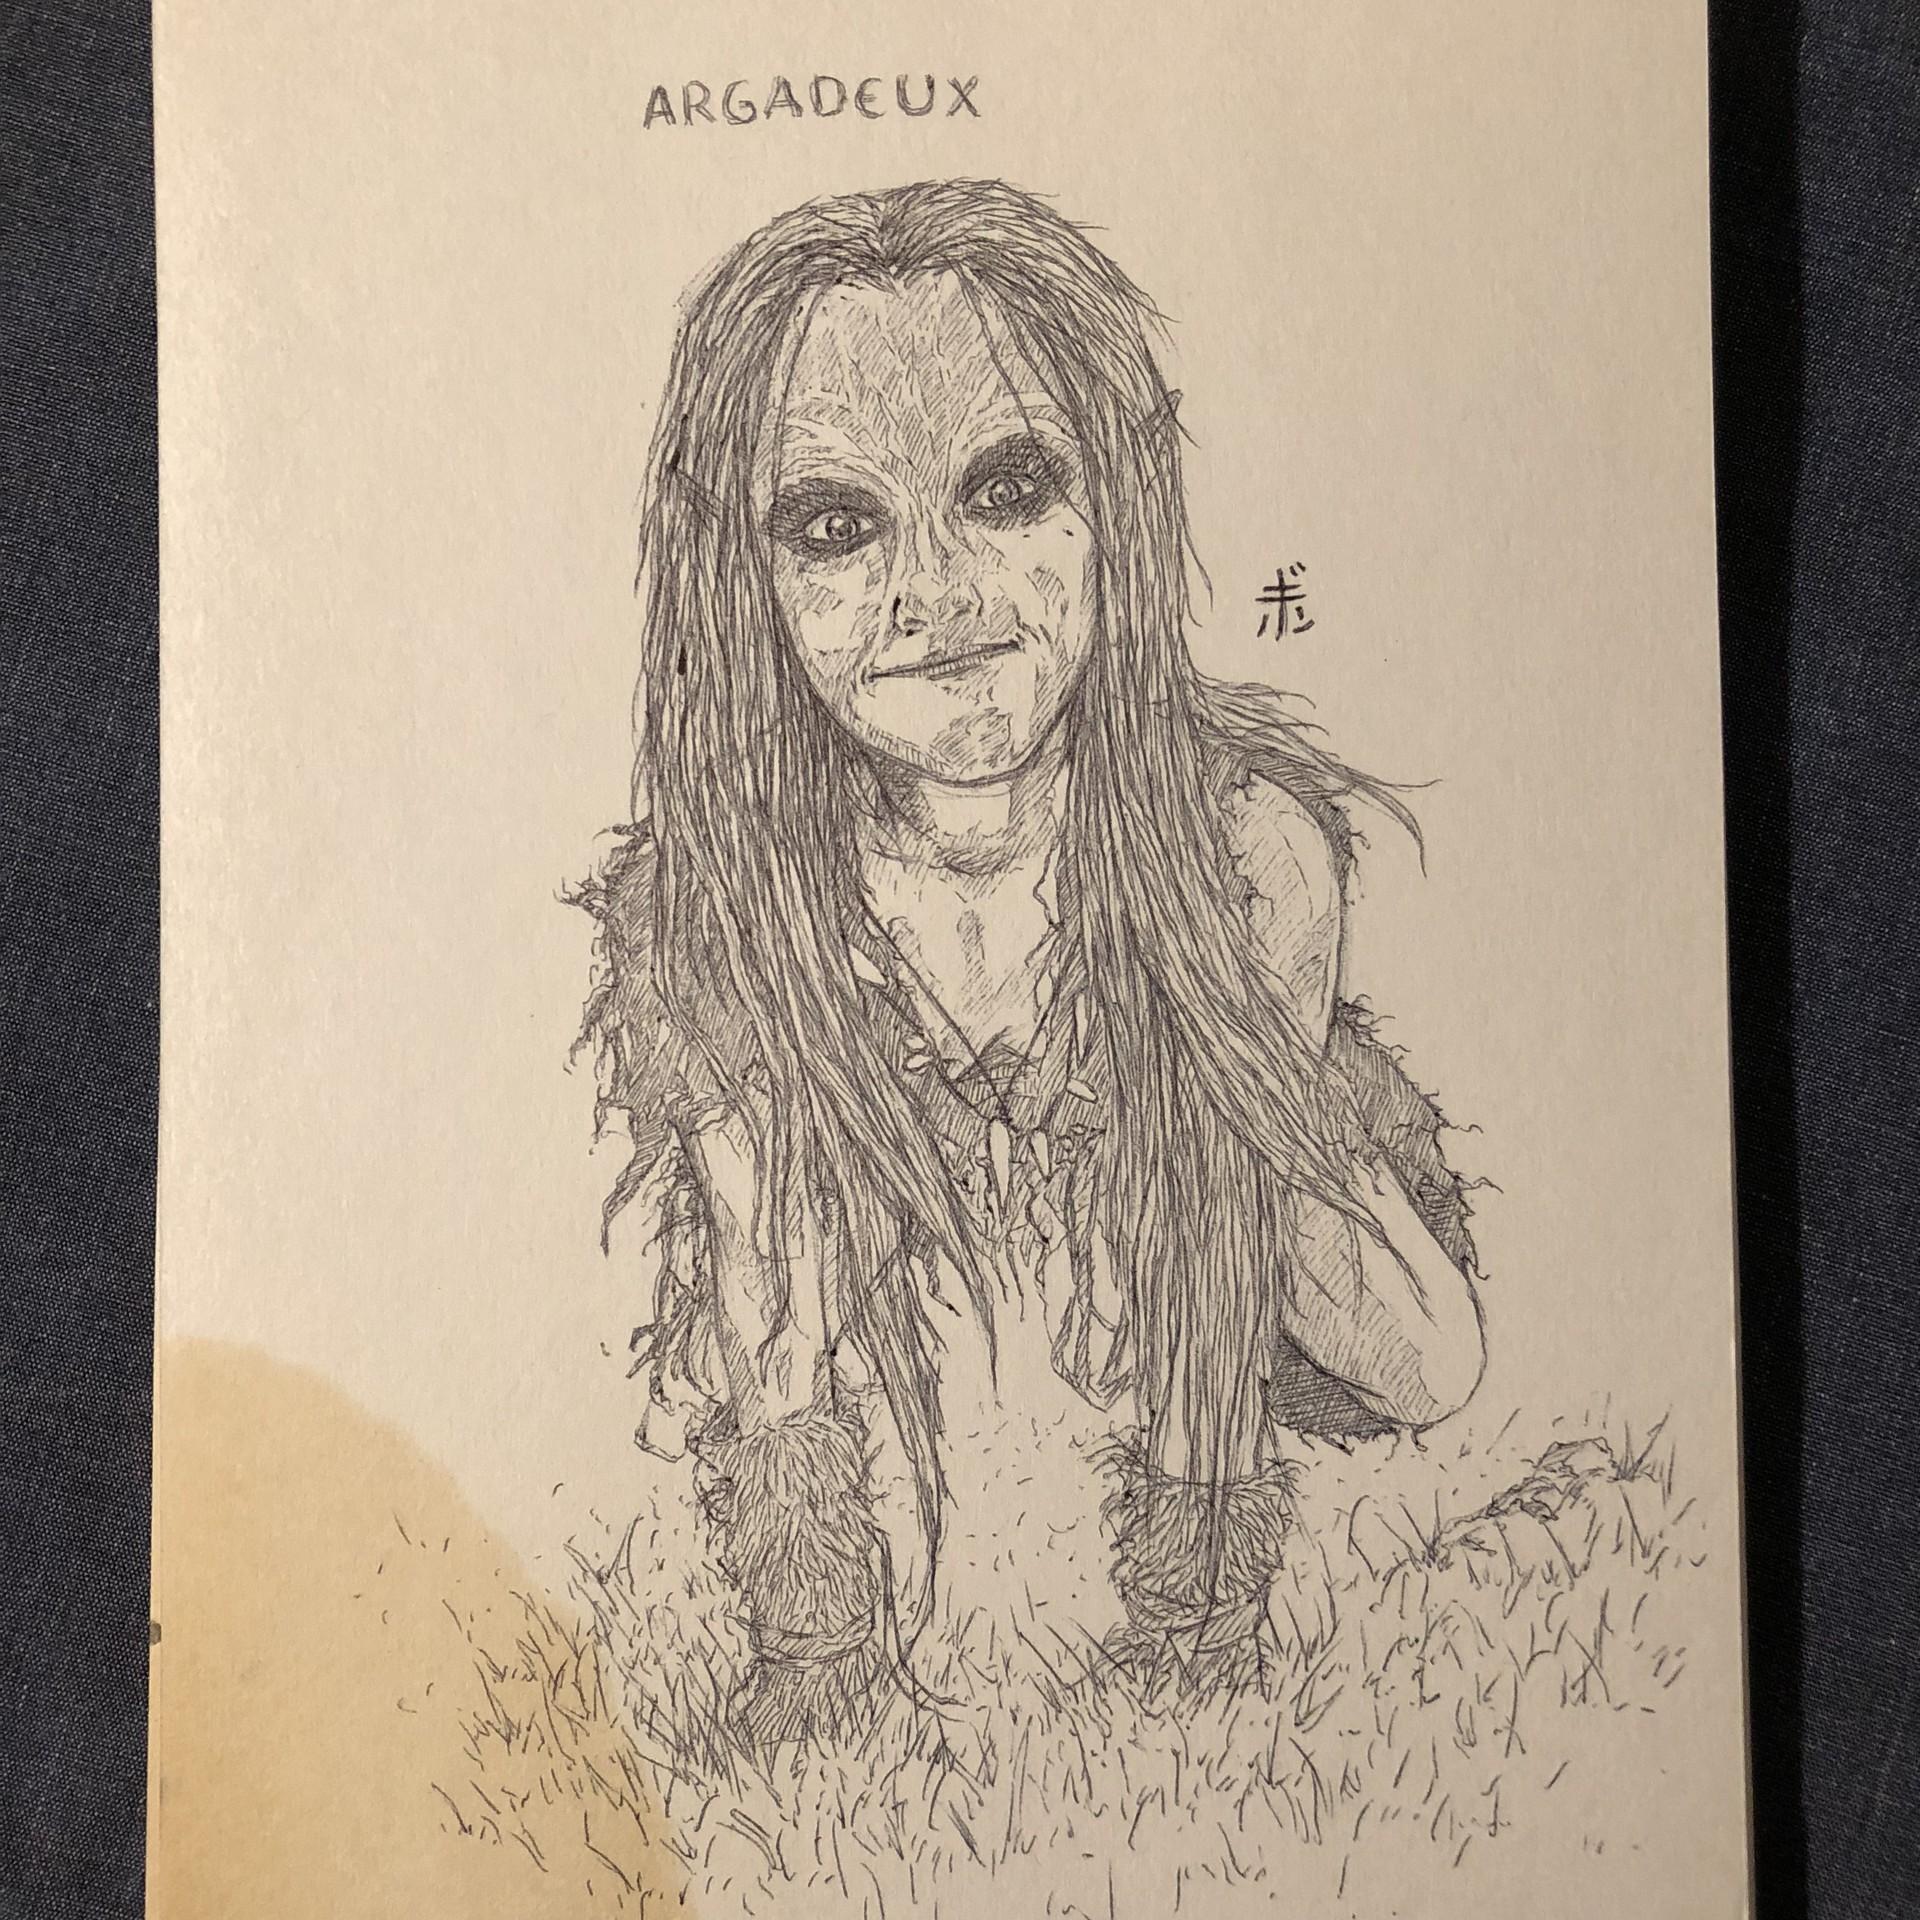 Argadeux img 2636